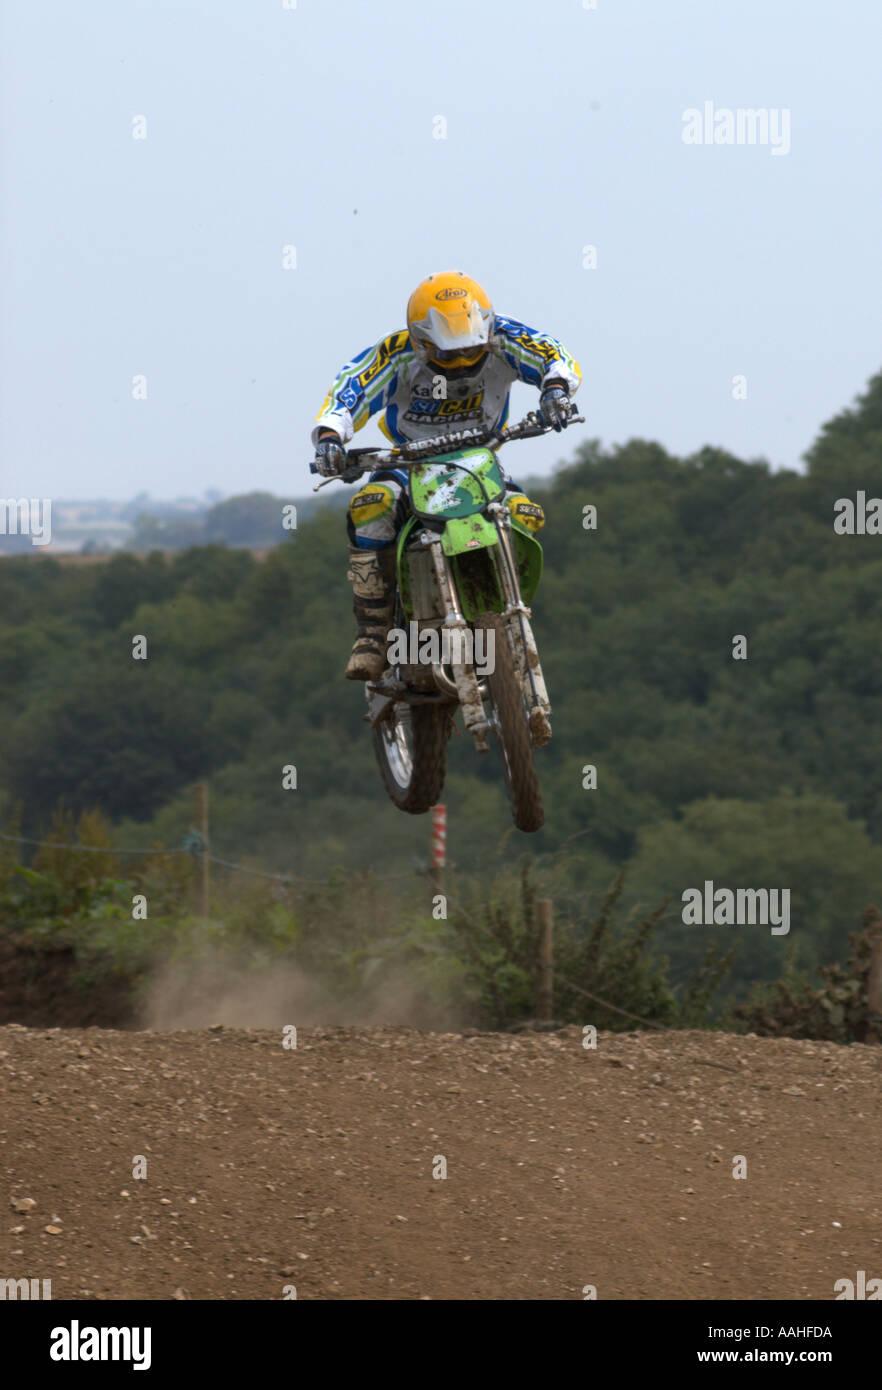 Racing Scrambling Moto cross. - Stock Image